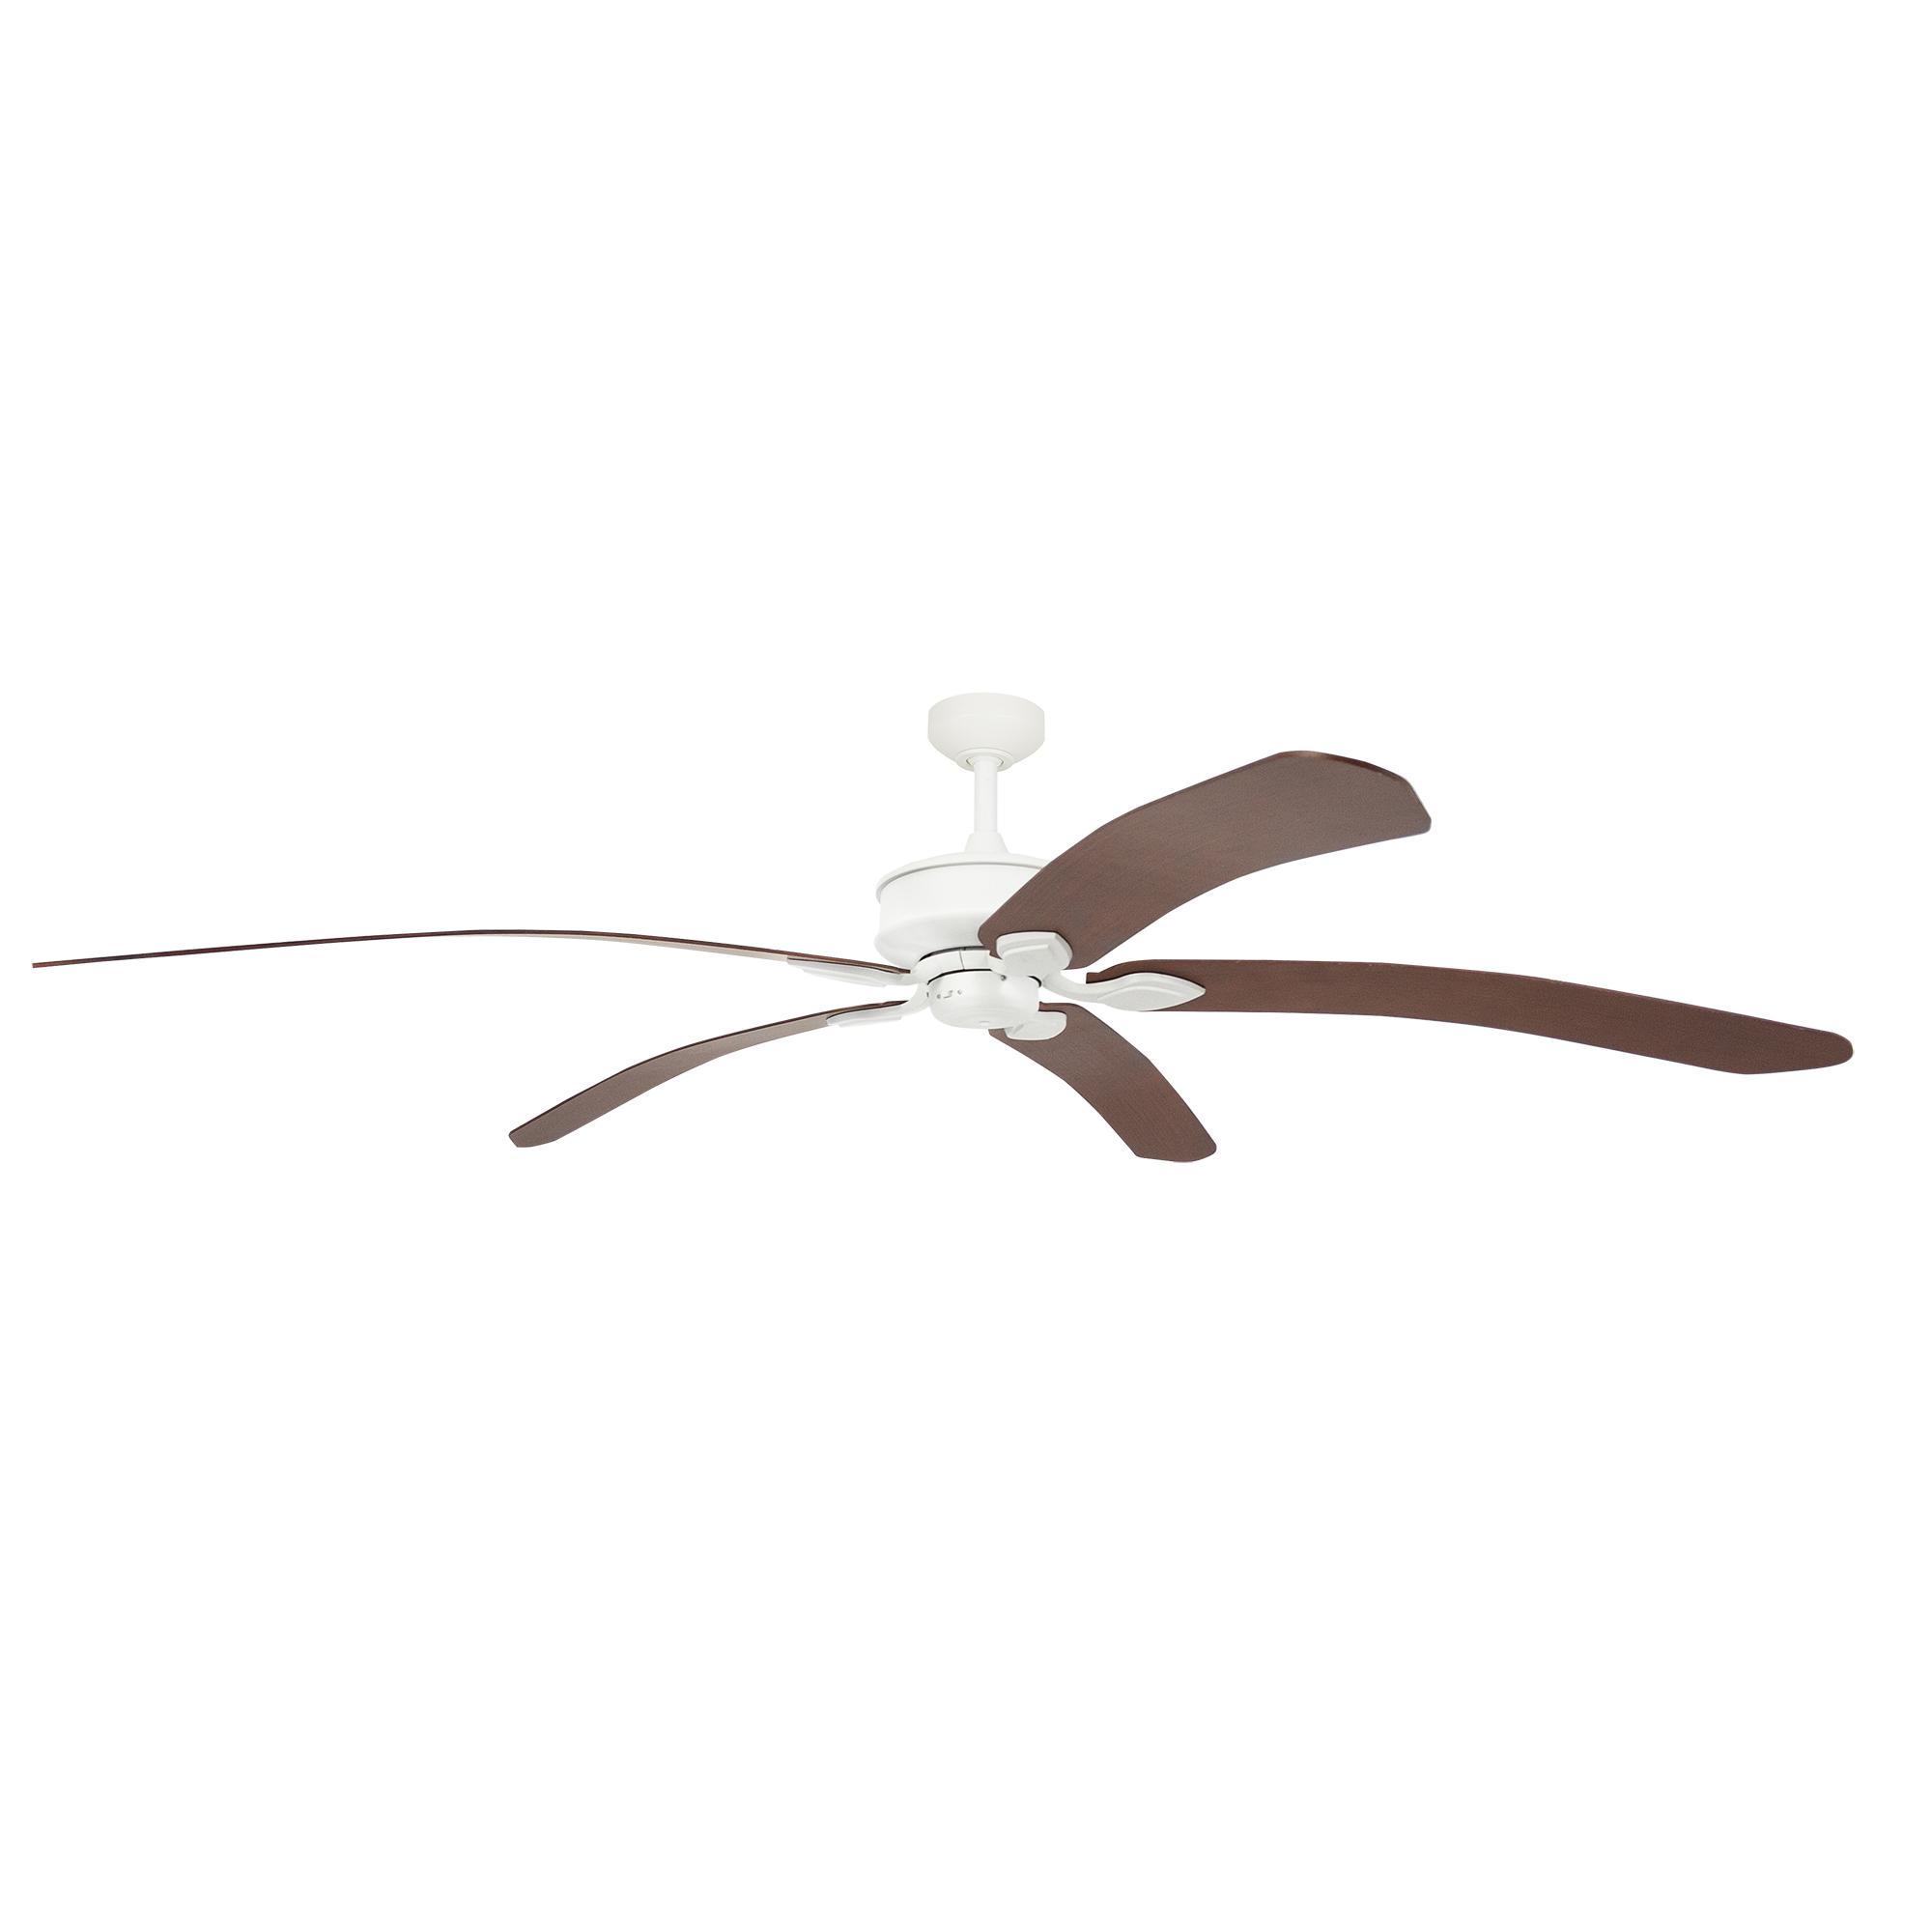 "72"" Tropicana Ceiling Fan in Matte White with Walnut blades"